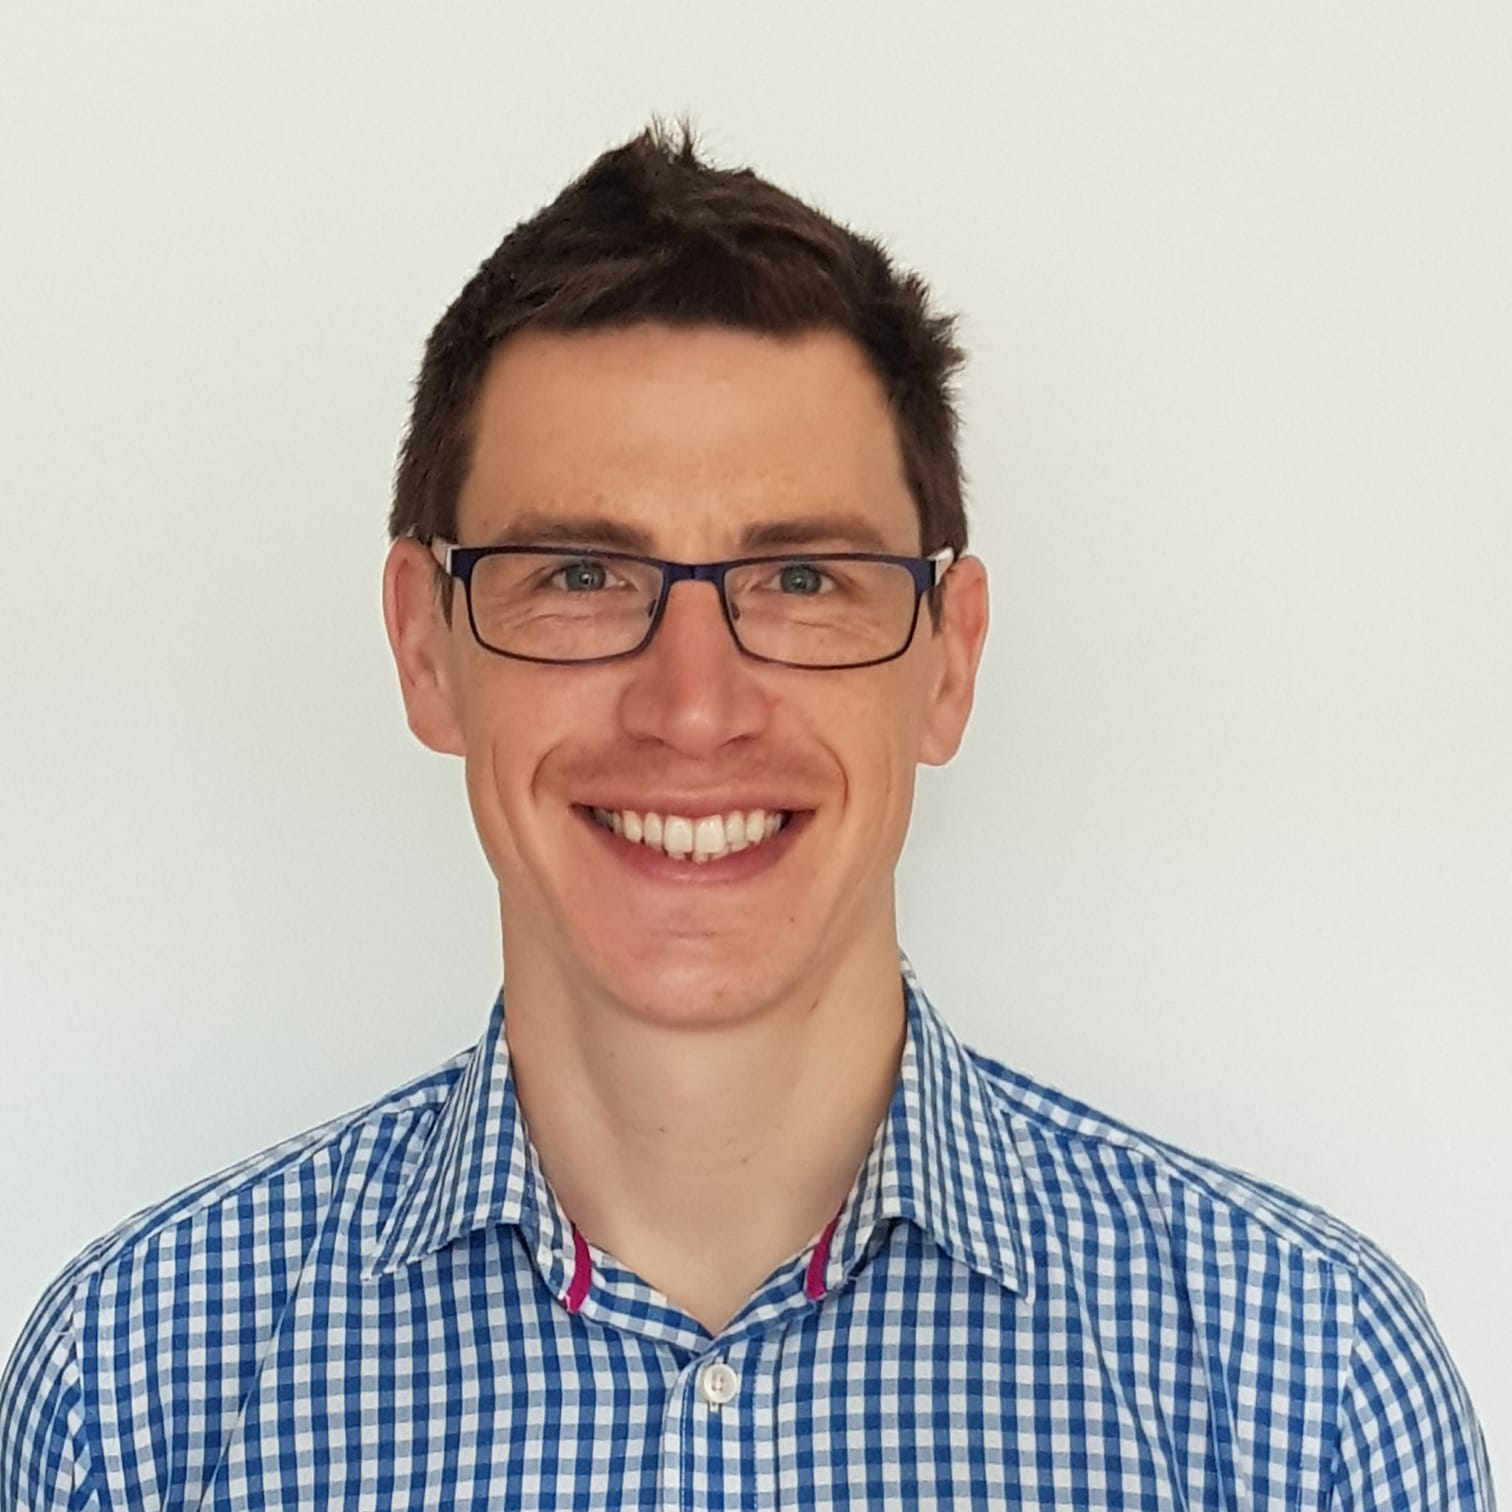 Dr Andrew Shrimpton